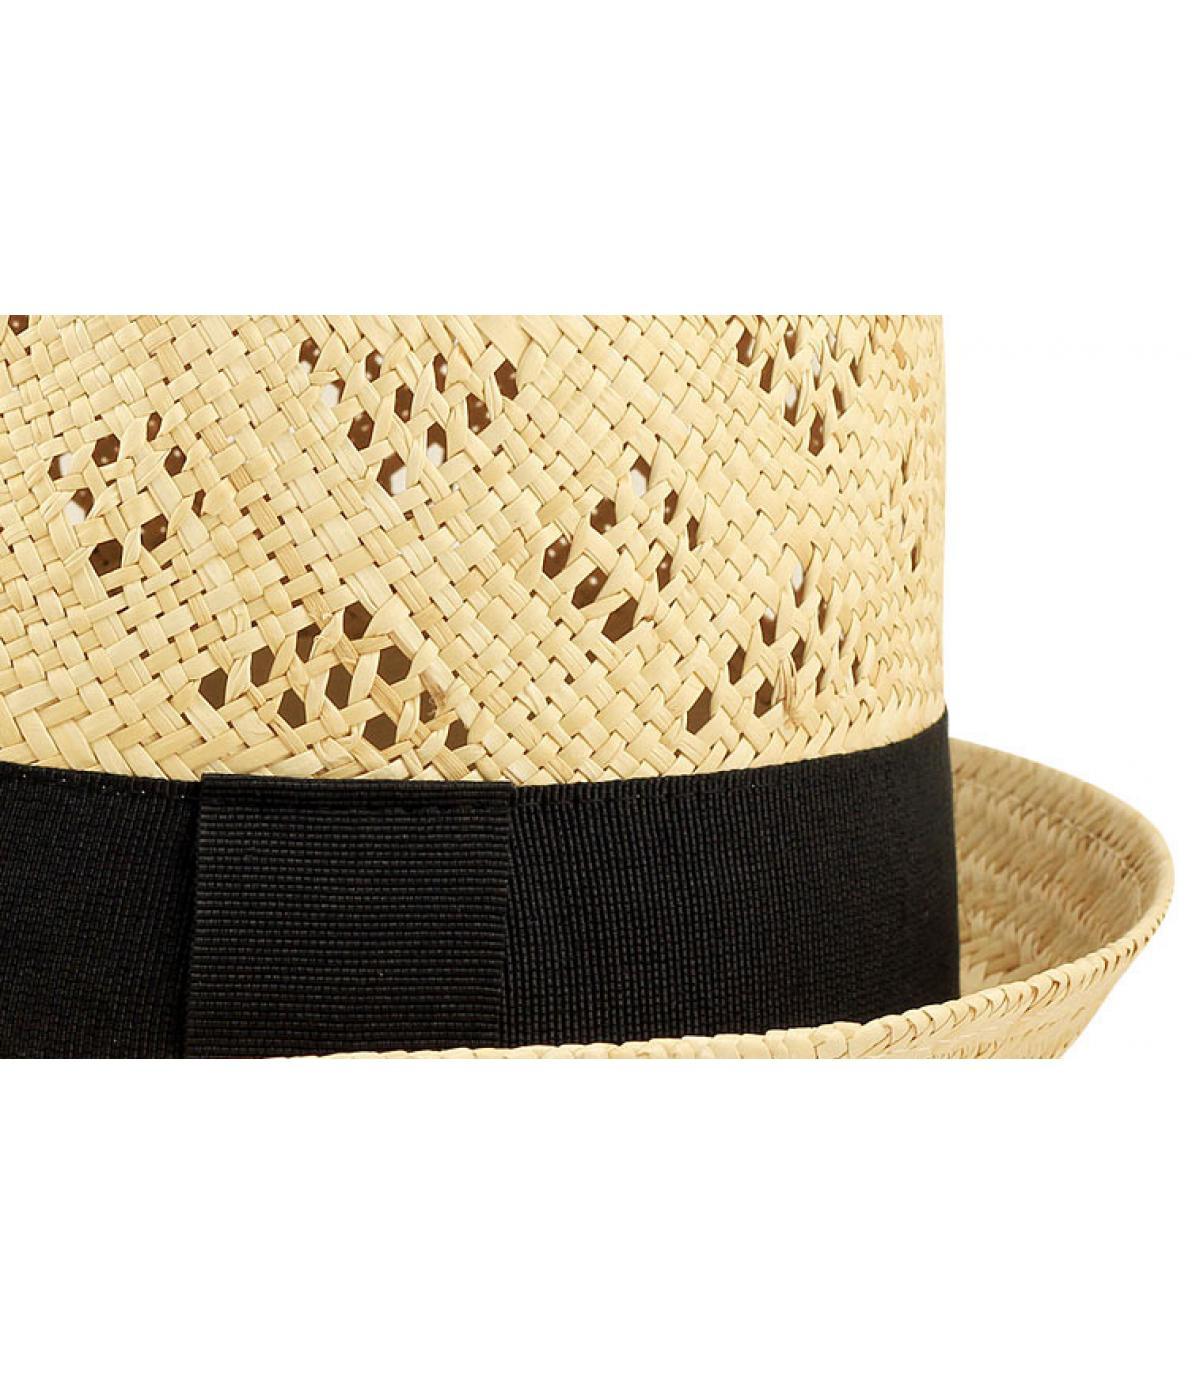 chapeau t femme carpino palma venti naturel wm par crambes. Black Bedroom Furniture Sets. Home Design Ideas